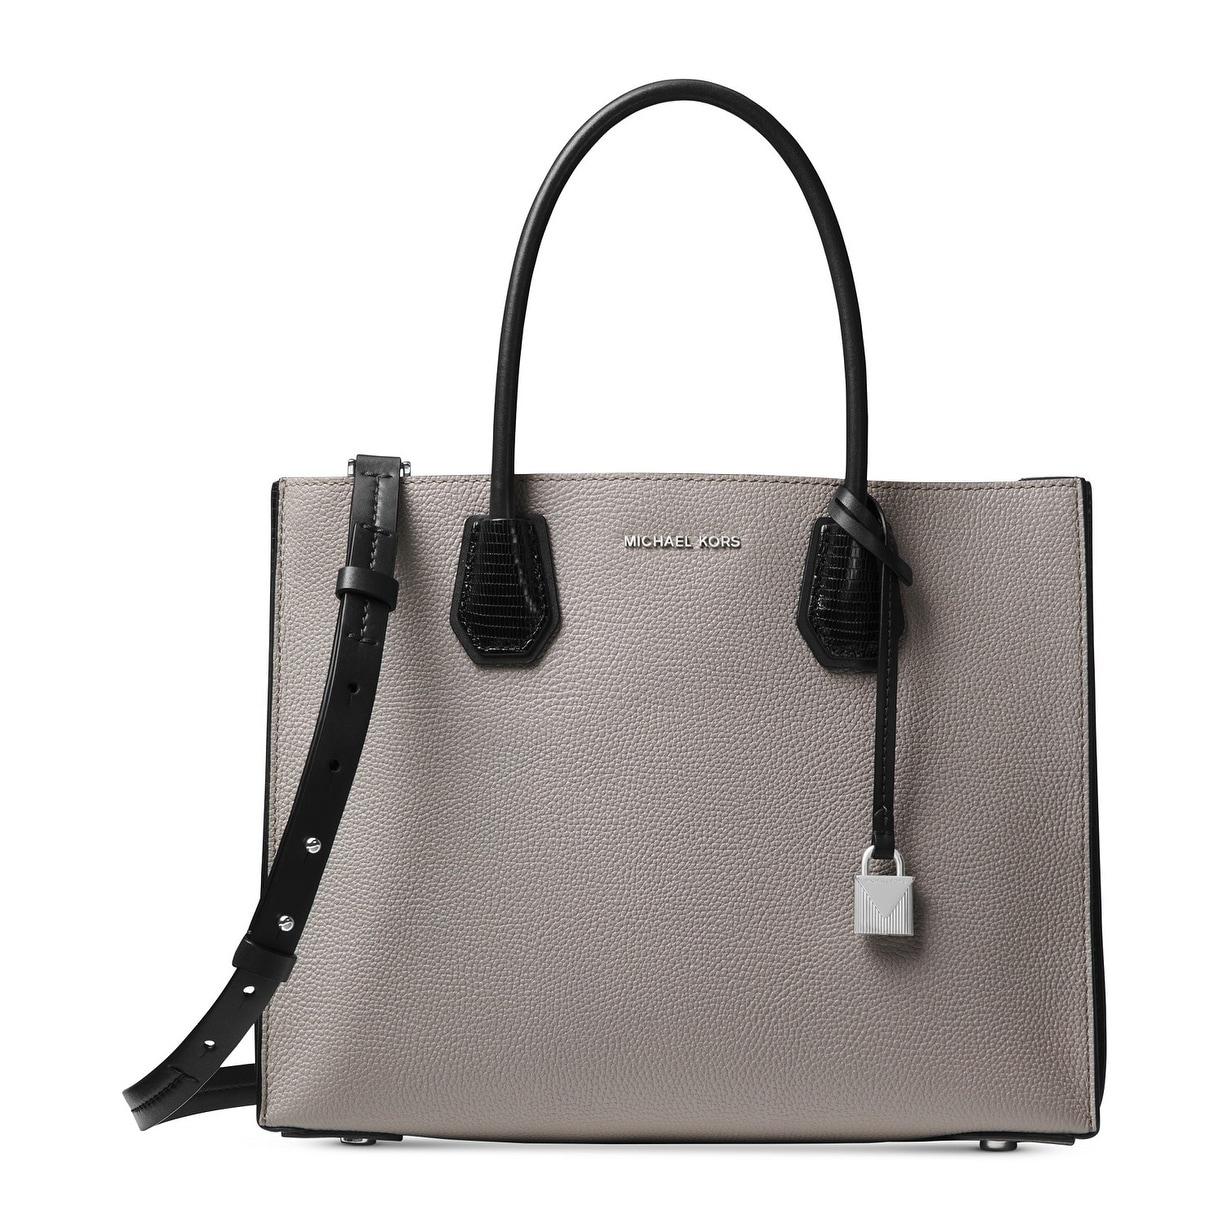 Buy Michael Kors Tote Bags Online at Overstock  97efdf749fcef